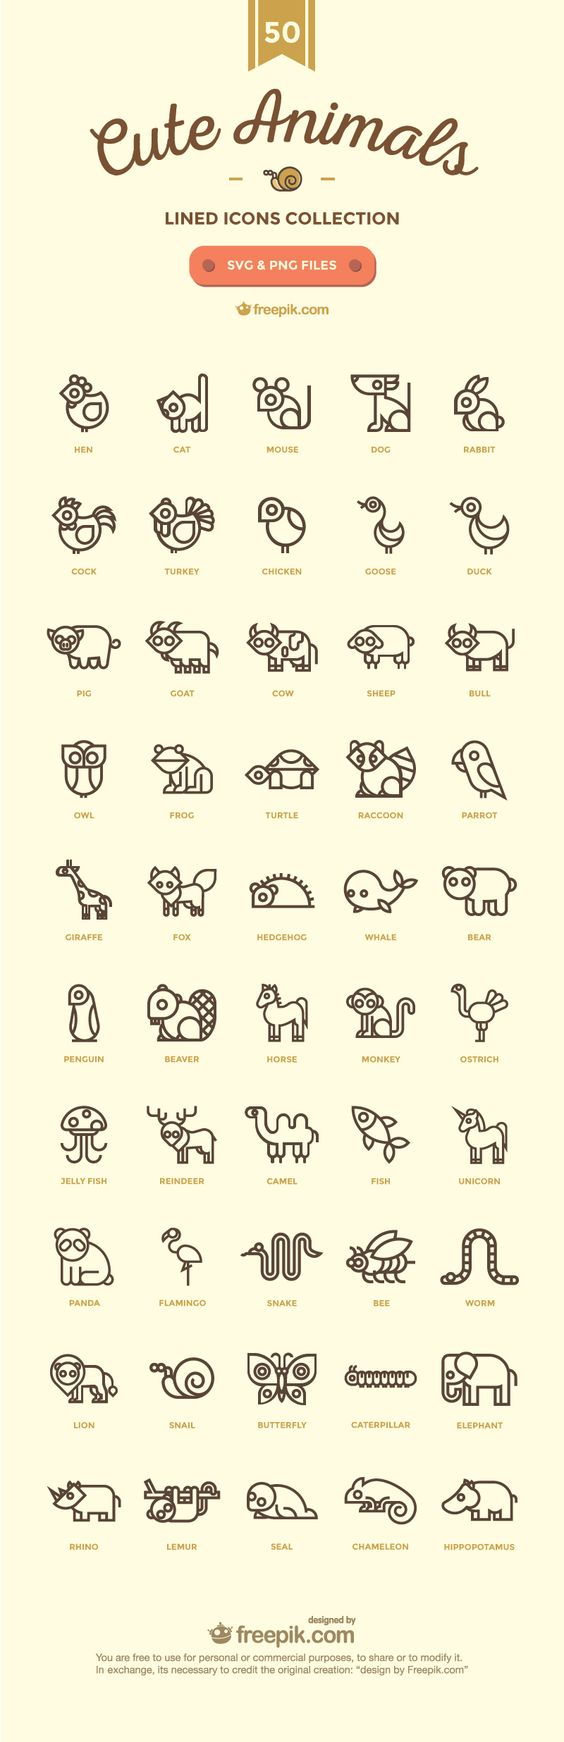 50-Cute Animals-02. Easy conversion to 8 bit cross stitch.